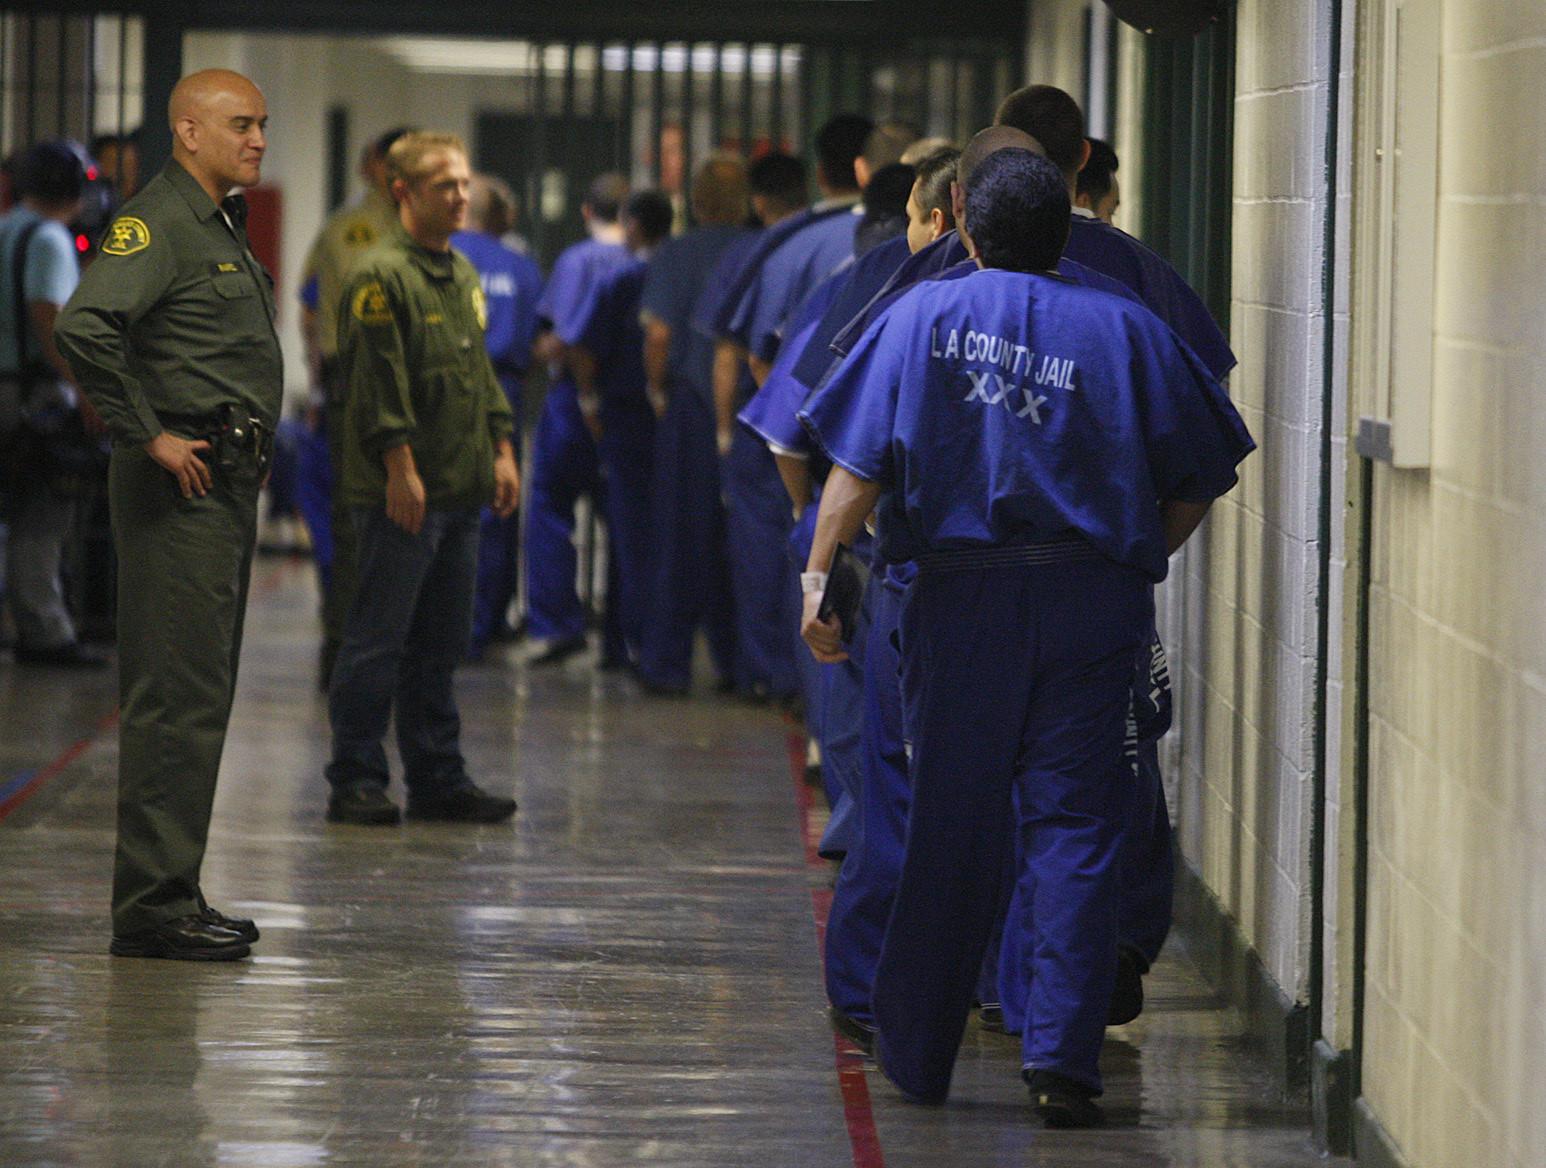 LA COUNTY JAIL - Inmate Reception Center Visitation | Mail ...